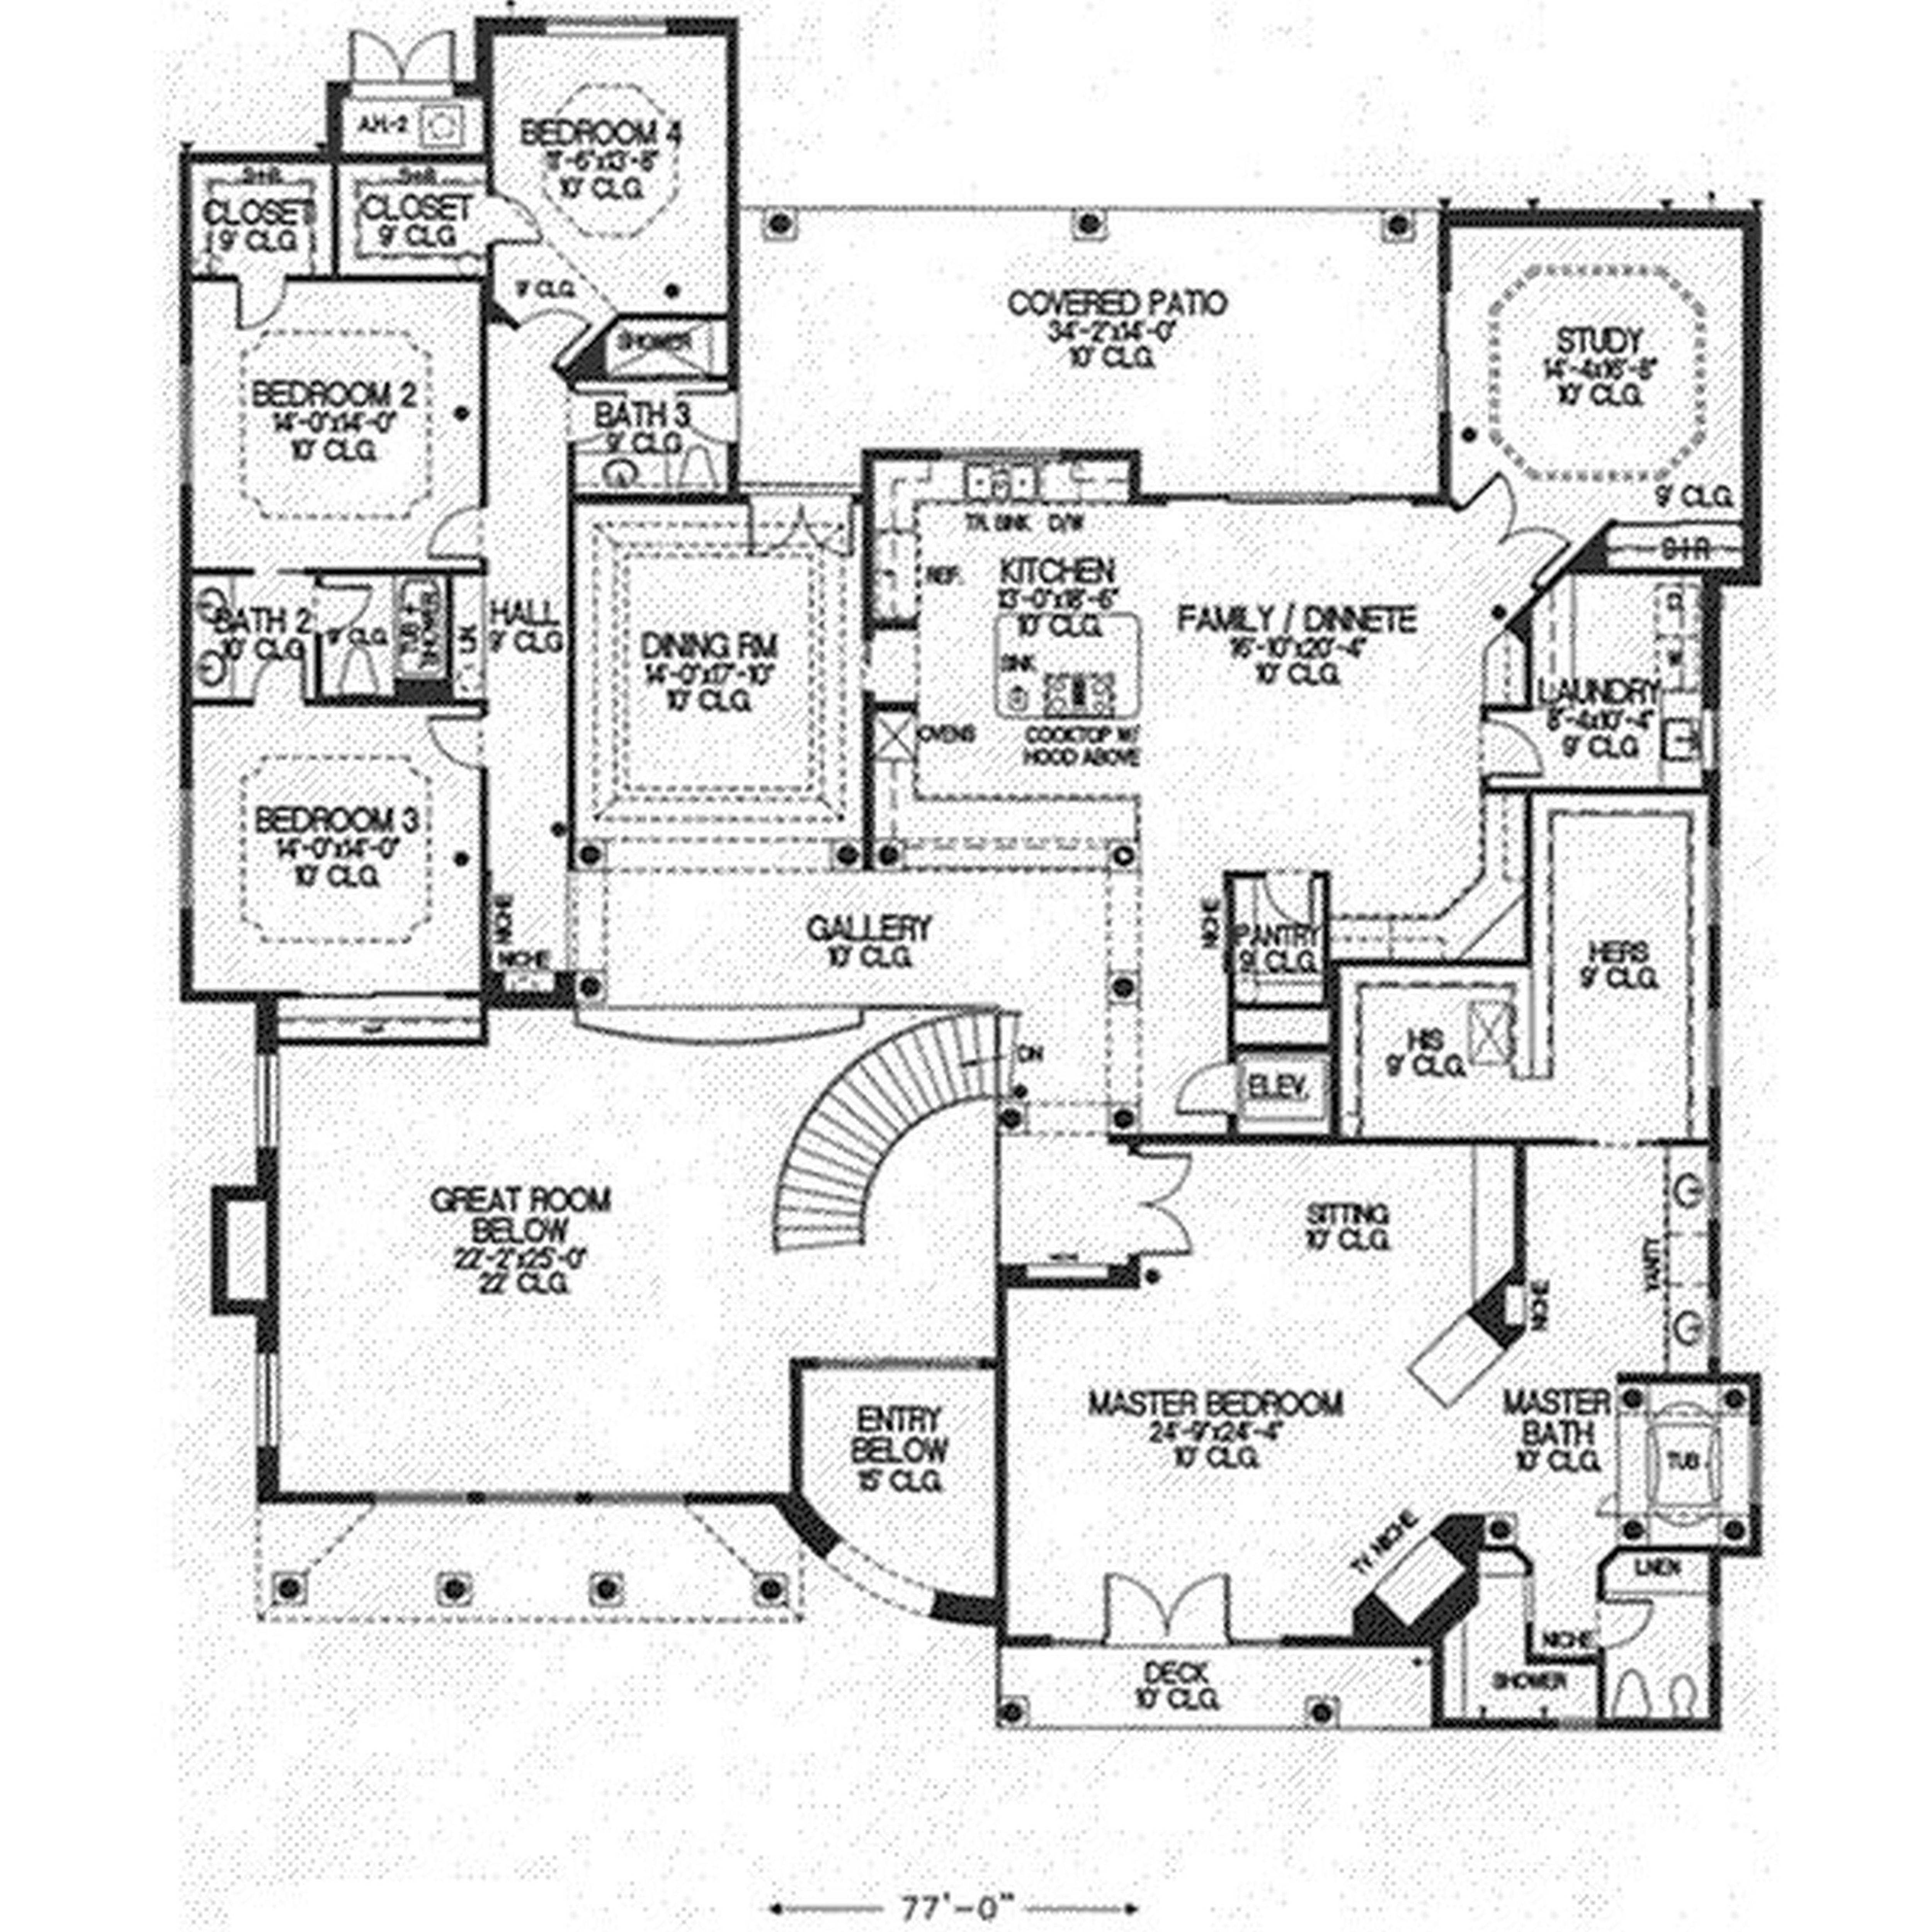 5000x5000 House Plan Building Drawing Plan Honda Accord Service B1 Types